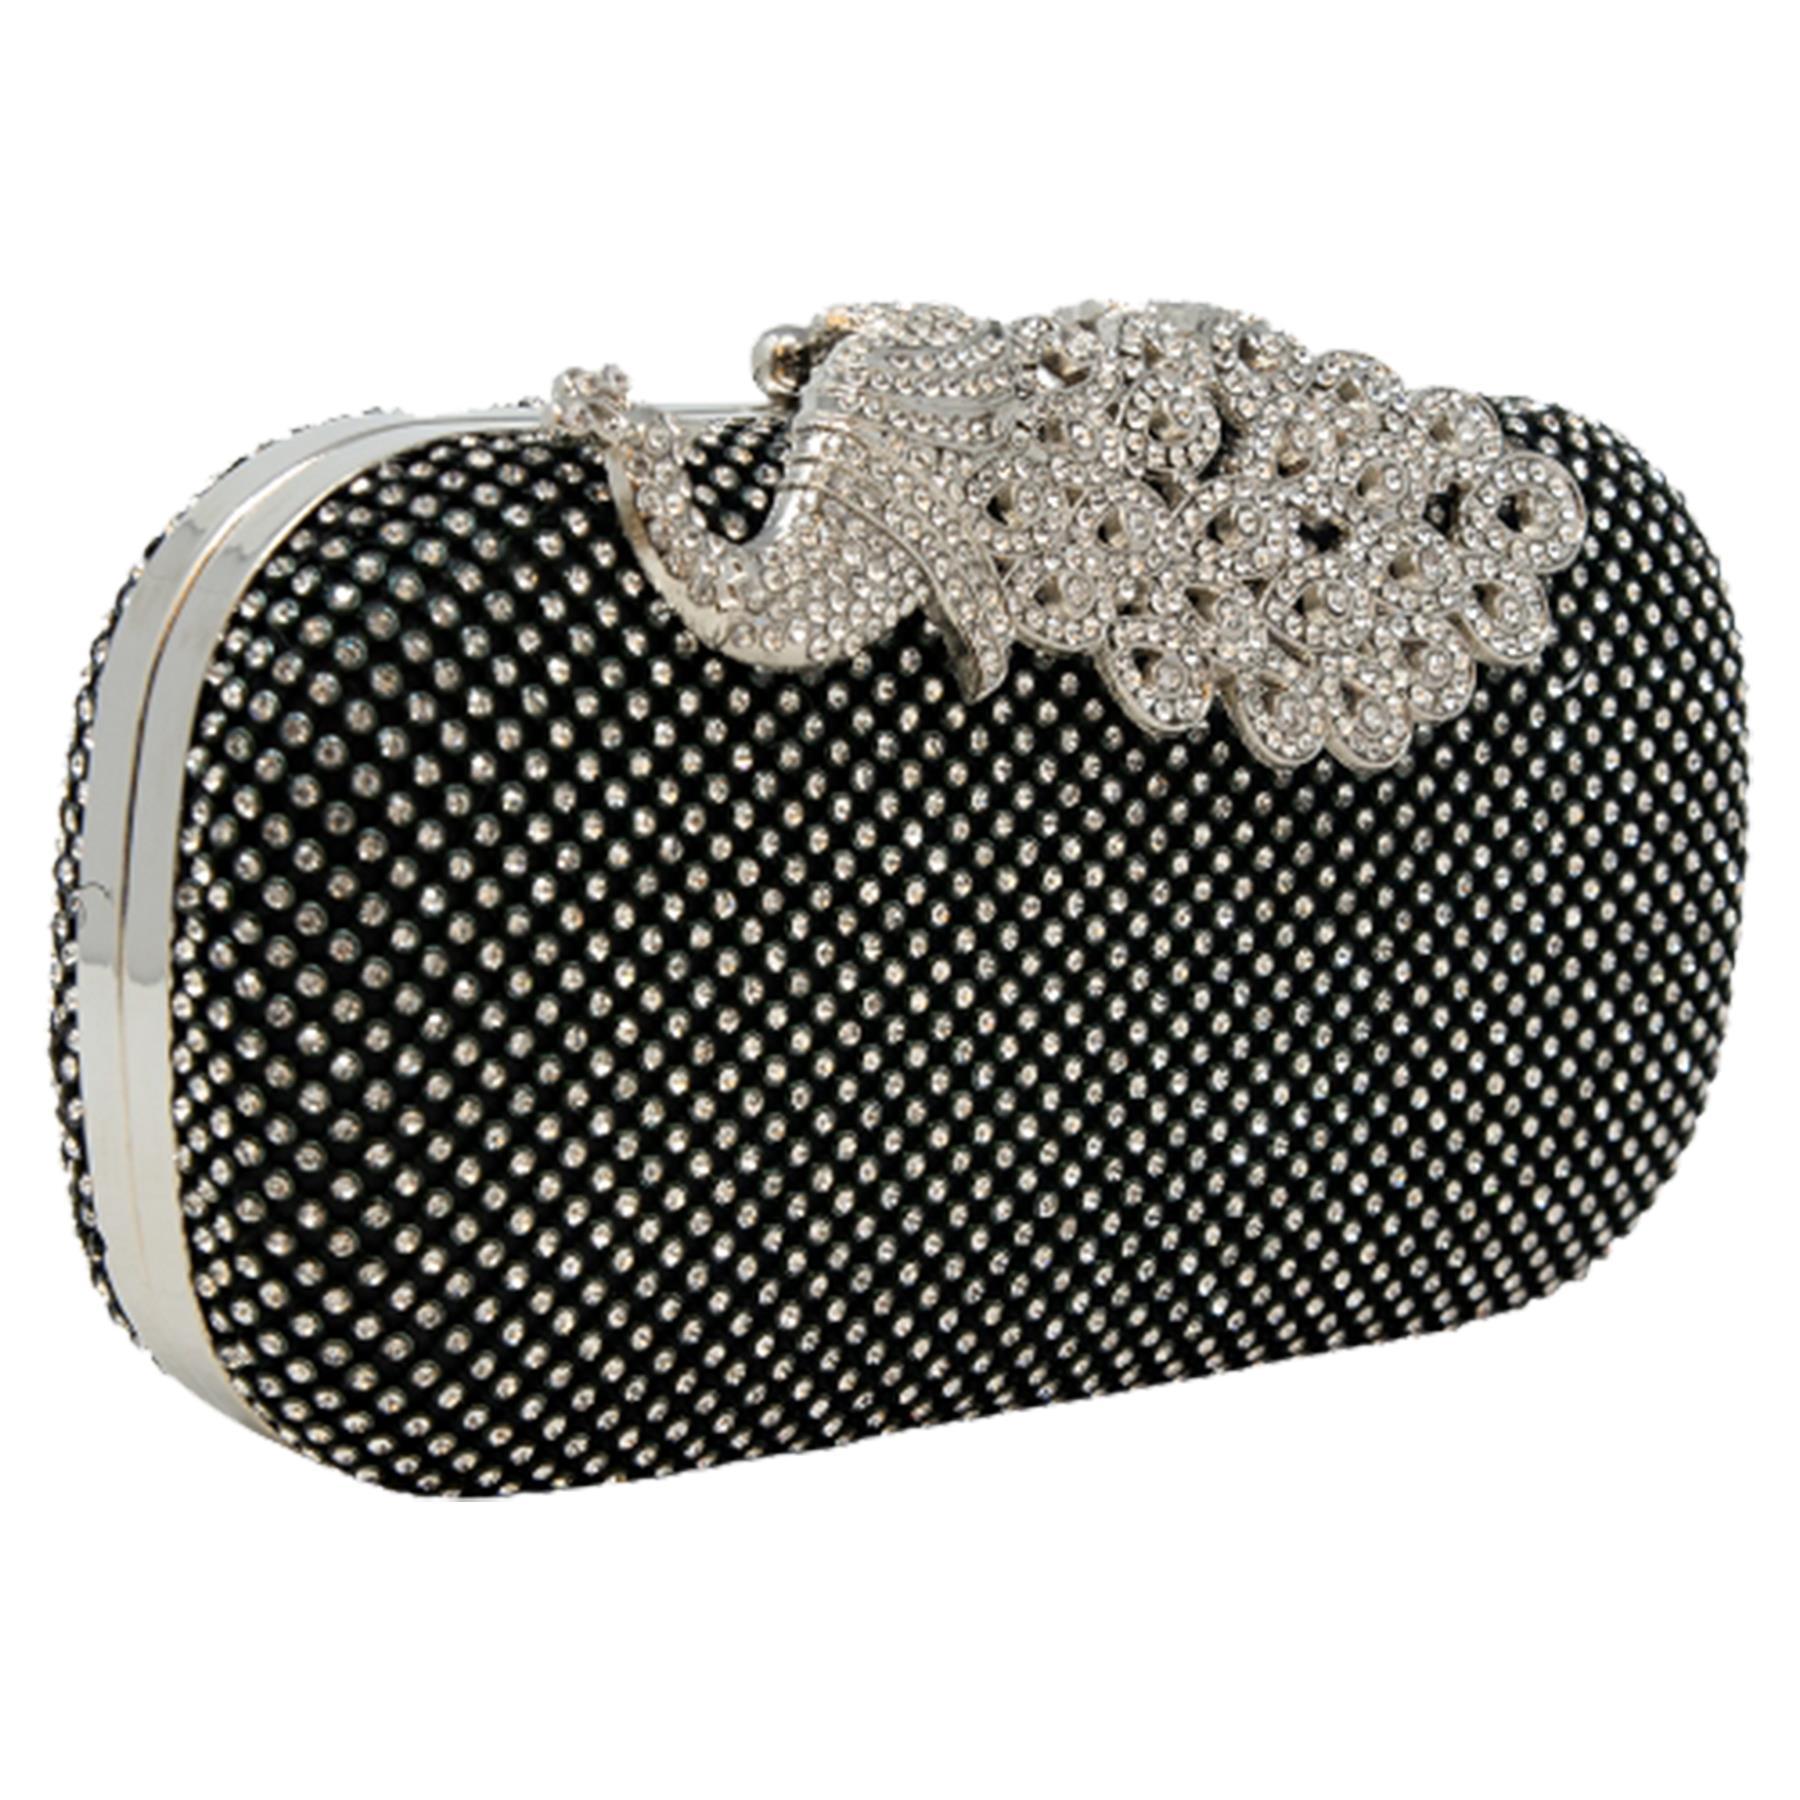 New-Women-s-Jewel-Elephant-Detail-Diamante-Chain-Box-Clutch-Bag-Purse thumbnail 3